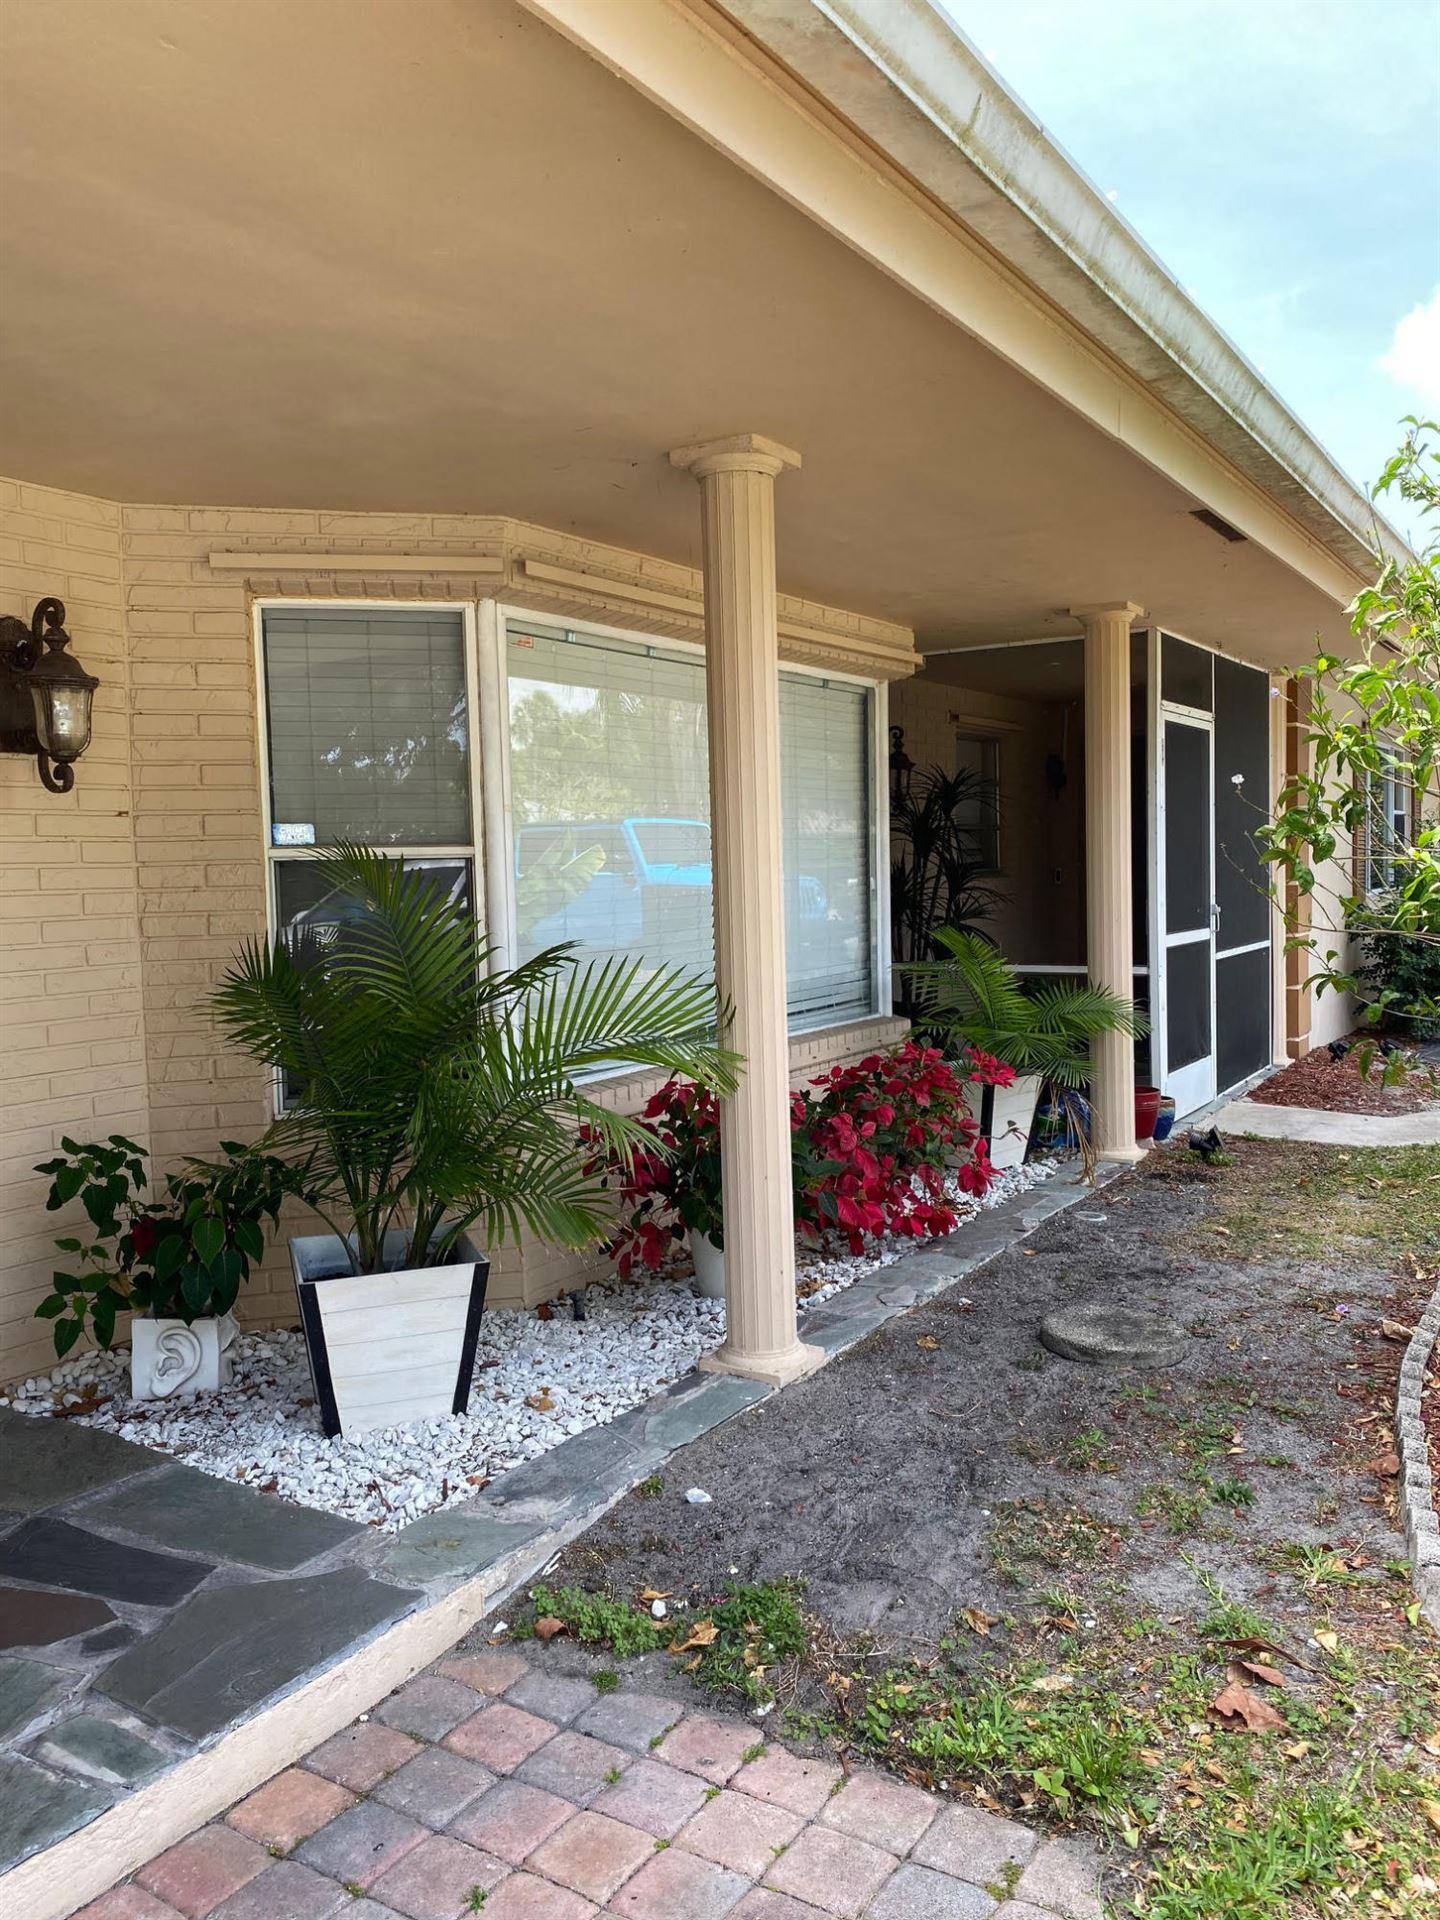 2082 S Conference Drive, Boca Raton, FL 33486 - MLS#: RX-10715106